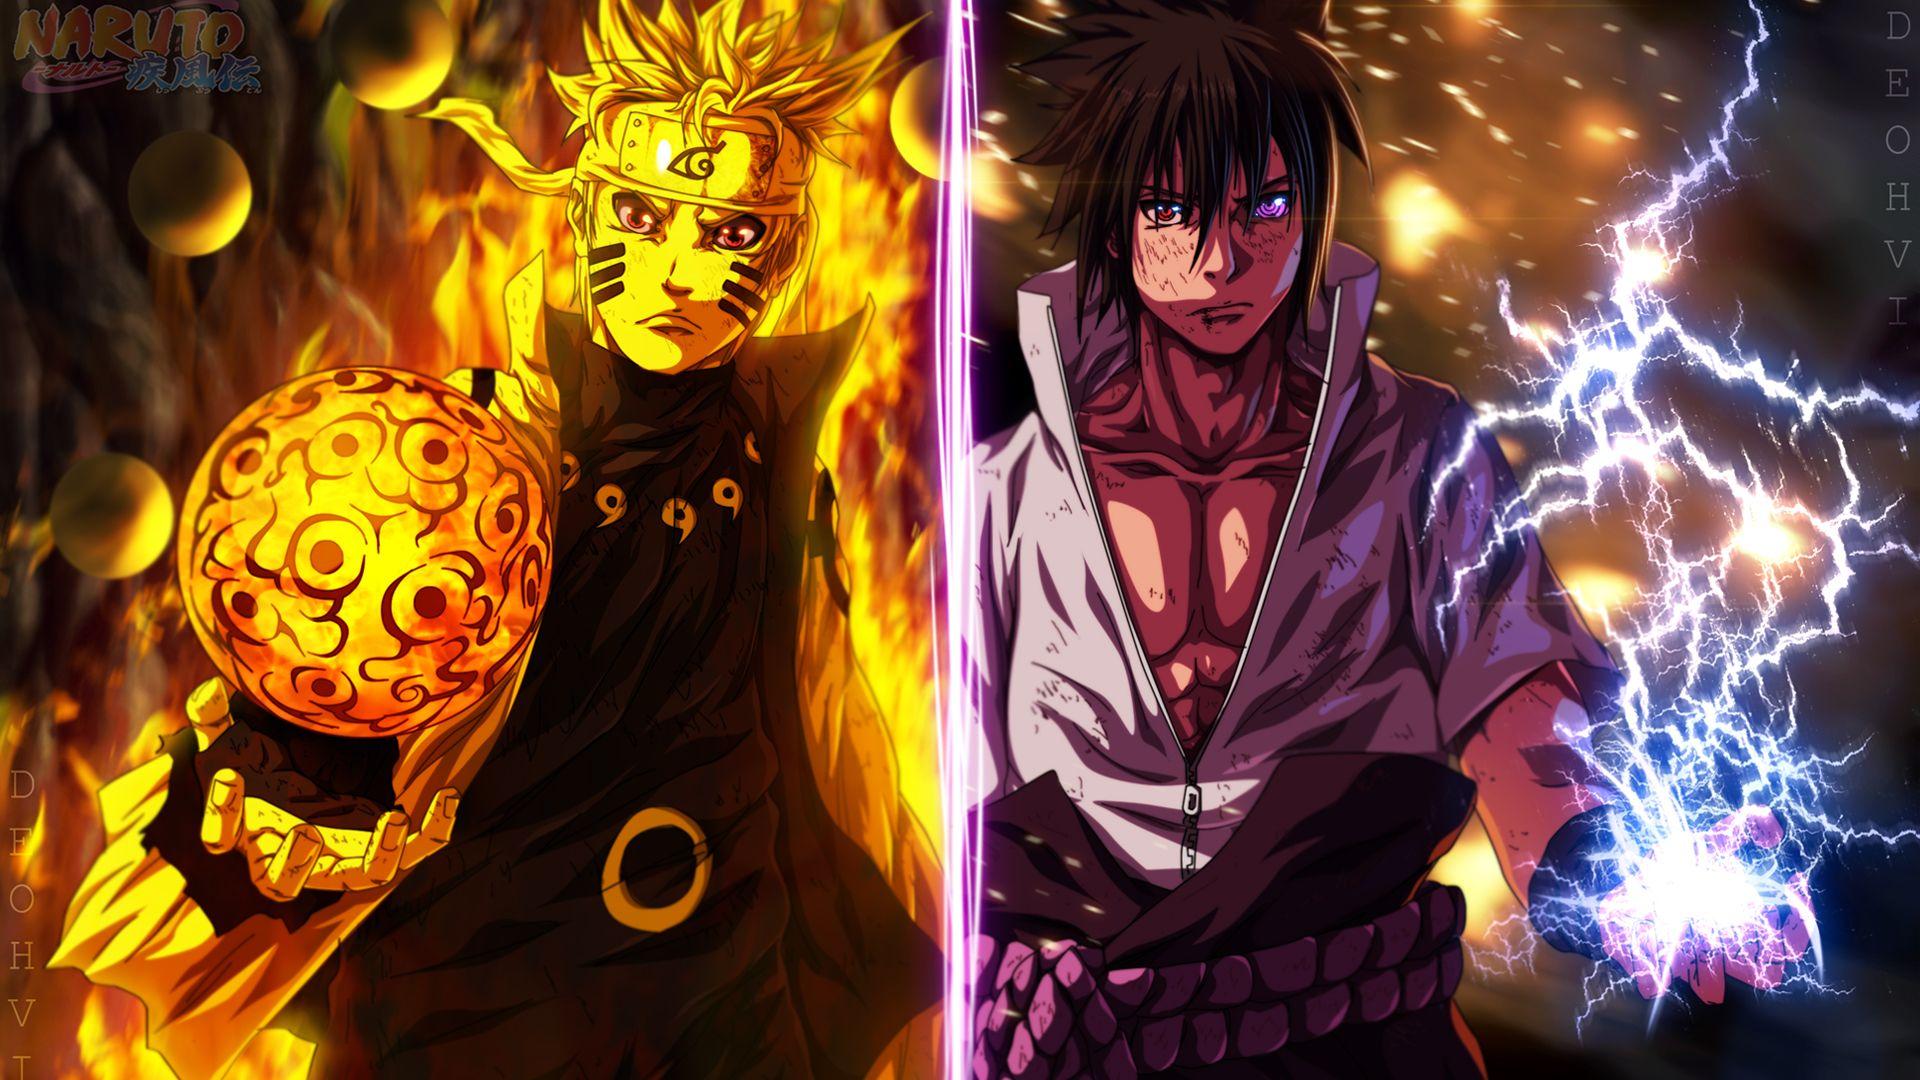 Naruto Vs Sasuke Wallpaper Background For Free Wallpaper